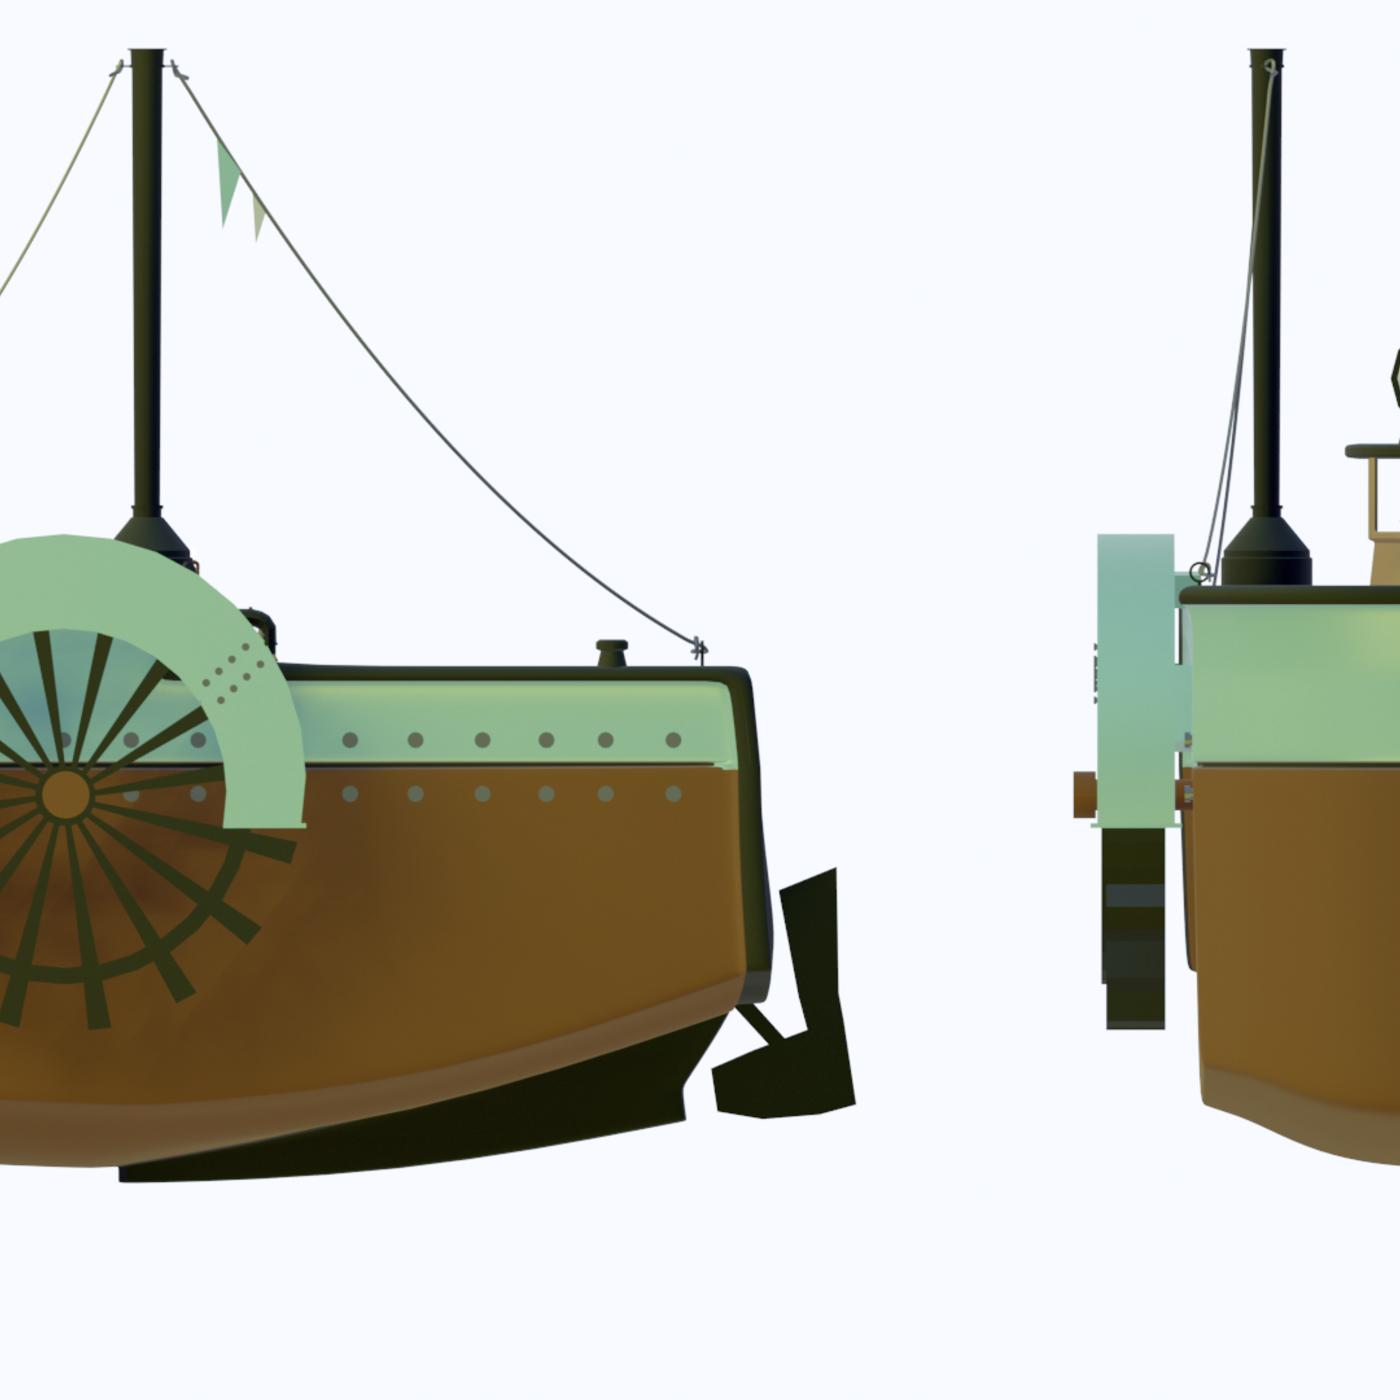 cartoon ship tug